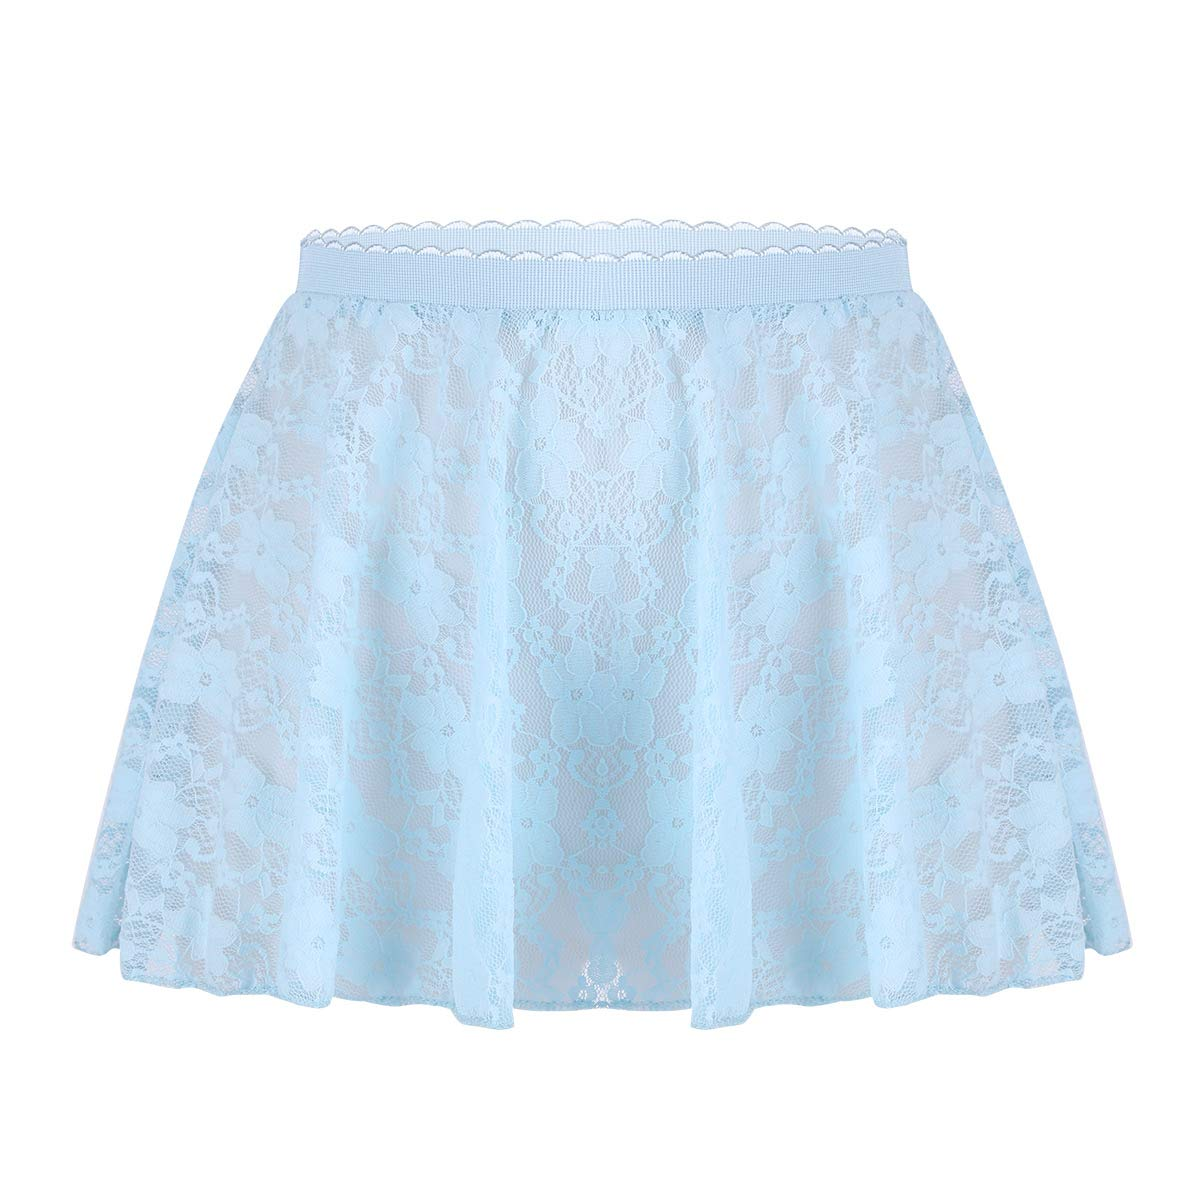 dPois Kids Girls' Basic Dance Wrap Skirt Chiffon Active Dress Classic Dancewear Sky Blue (Lace) 4-5